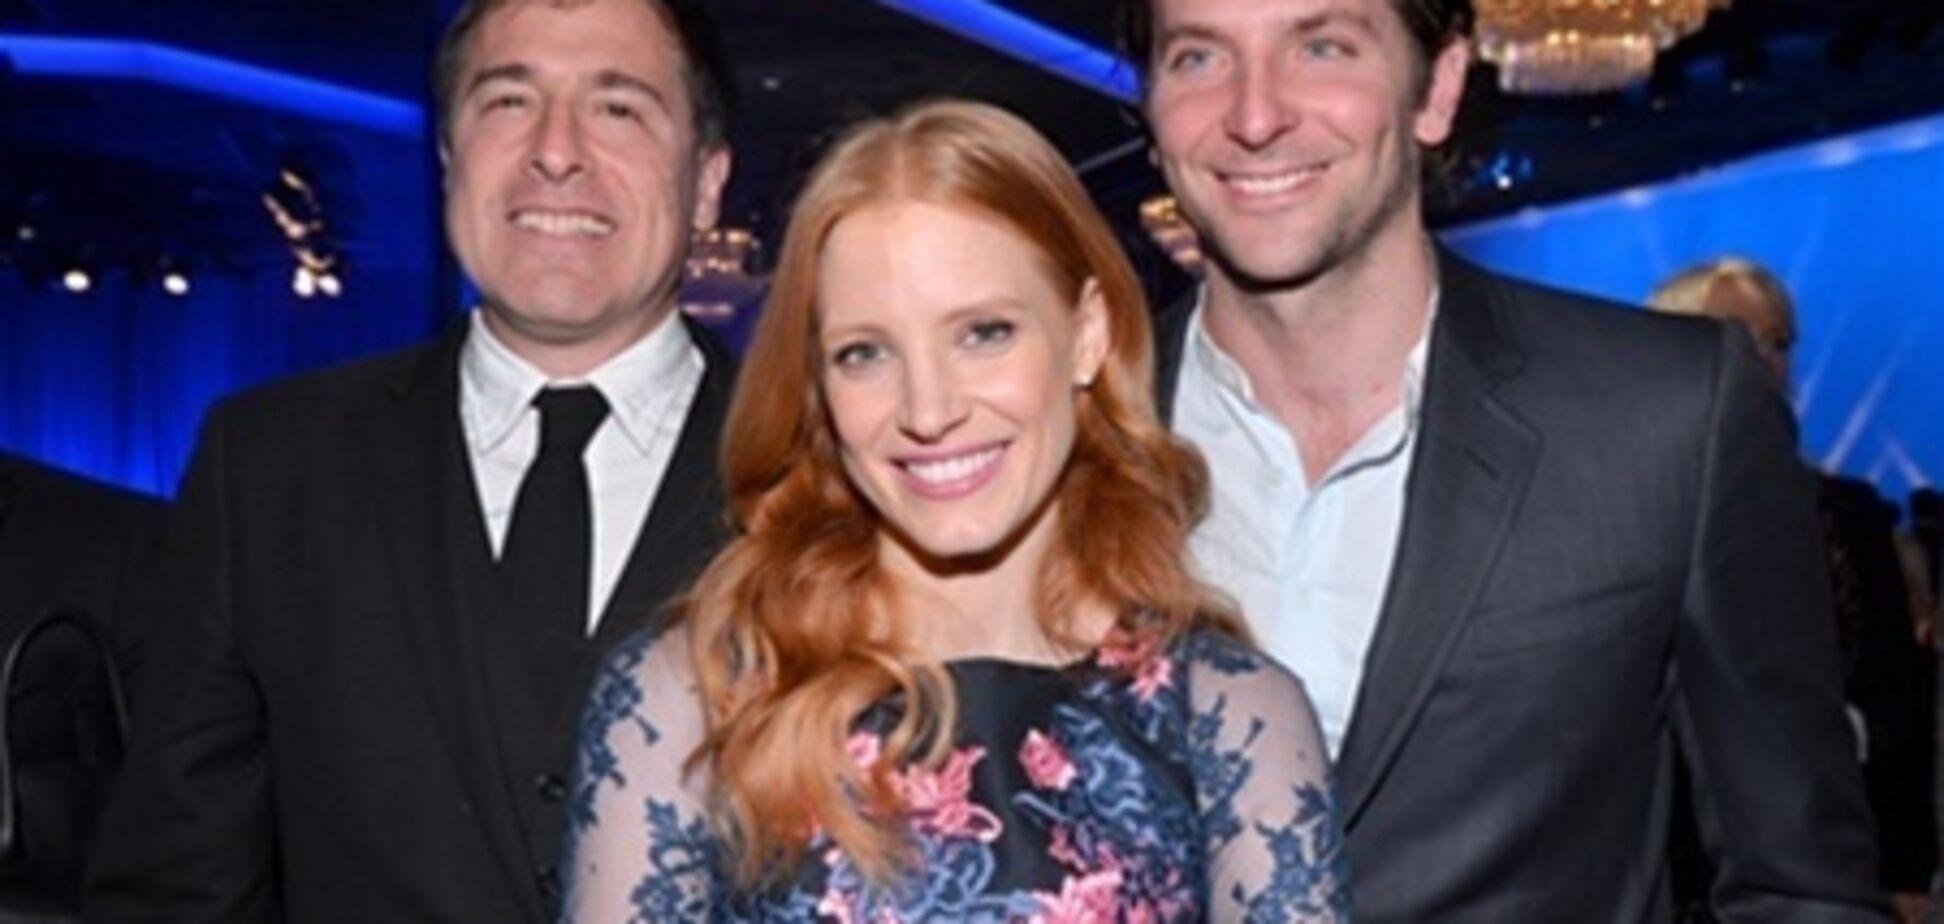 Номинанты на Оскар собрались на вечеринку. Фото